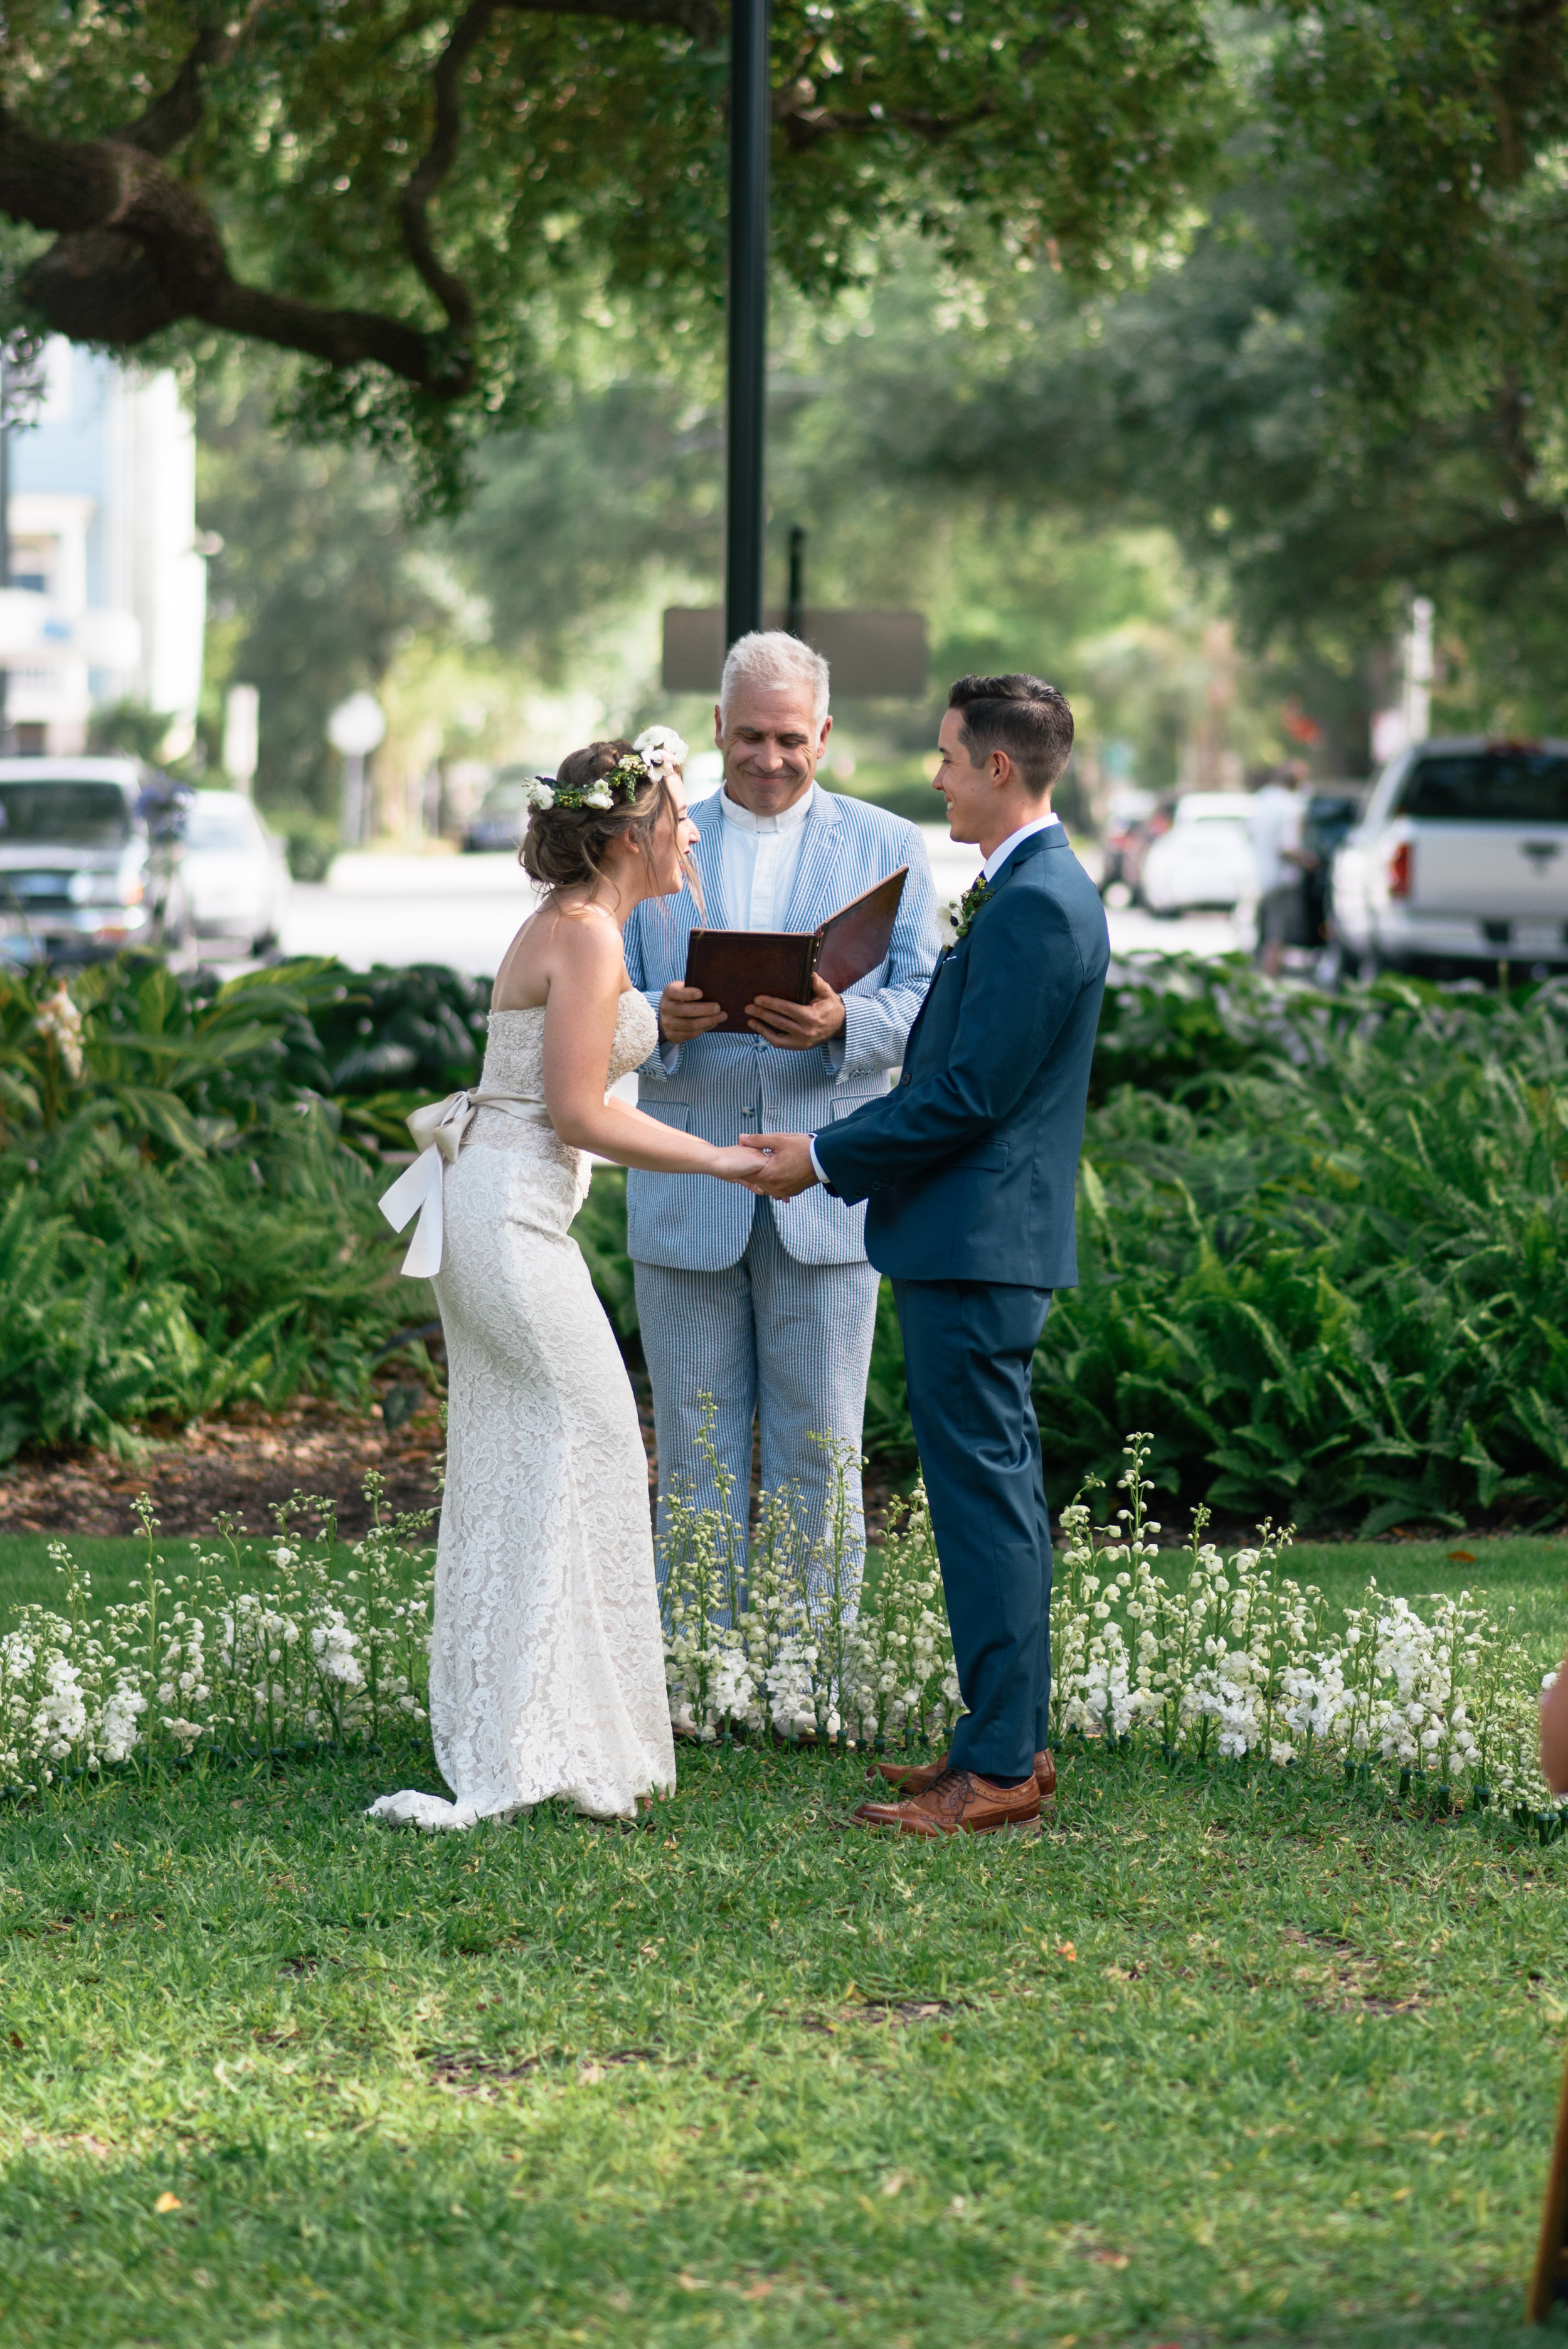 savannah-station-elopement-photographer-savannah-elopement-photography-savannah-georgia-elopement-photographer-savannah-wedding-photographer-meg-hill-photo-jade-hill- (64 of 93).jpg